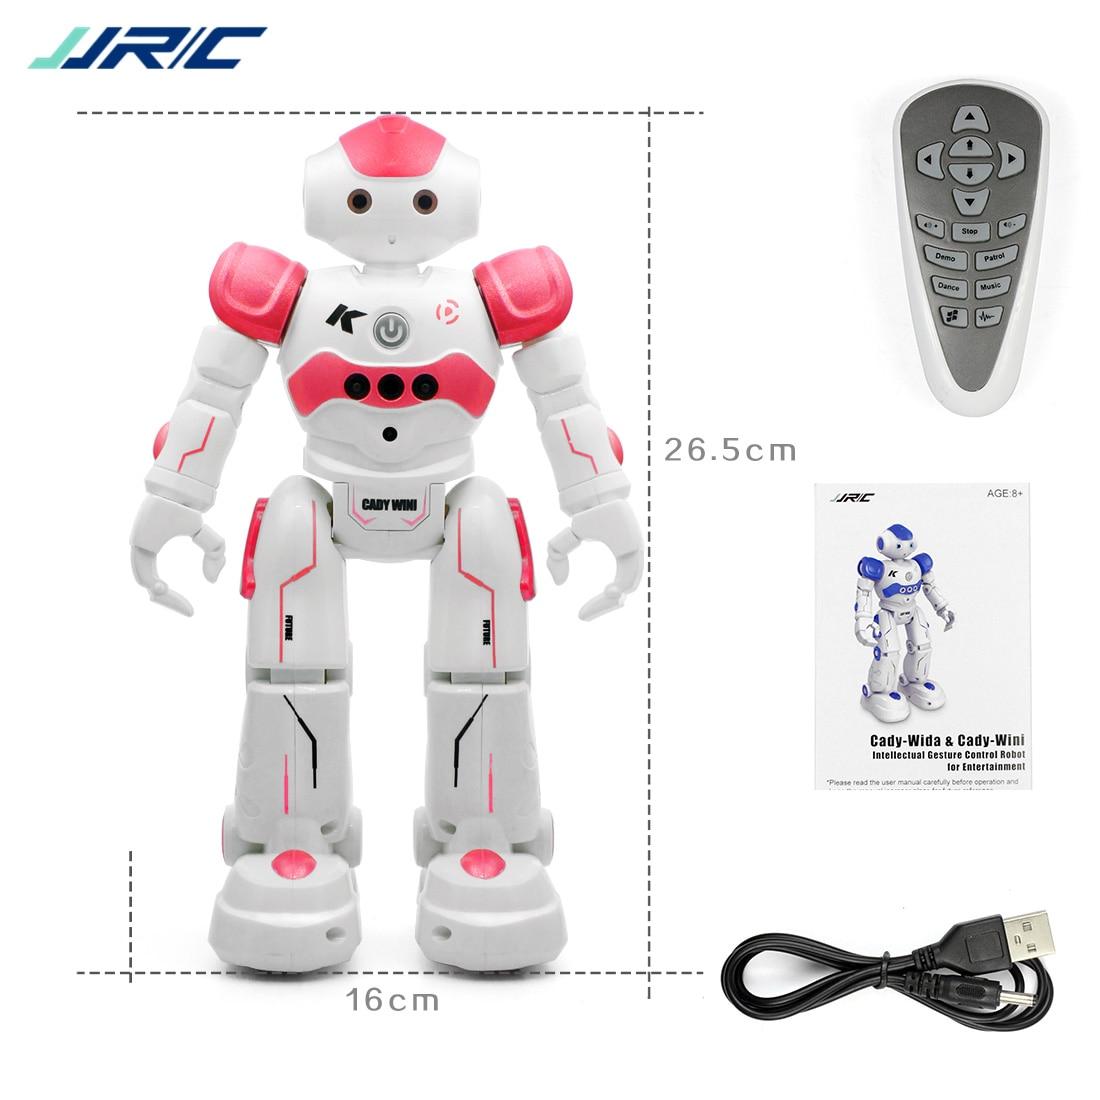 JJRC R2 RC Robot Gesture Sensor Dancing Intelligent Program CADY WIDA Toy Accessories F22252 53